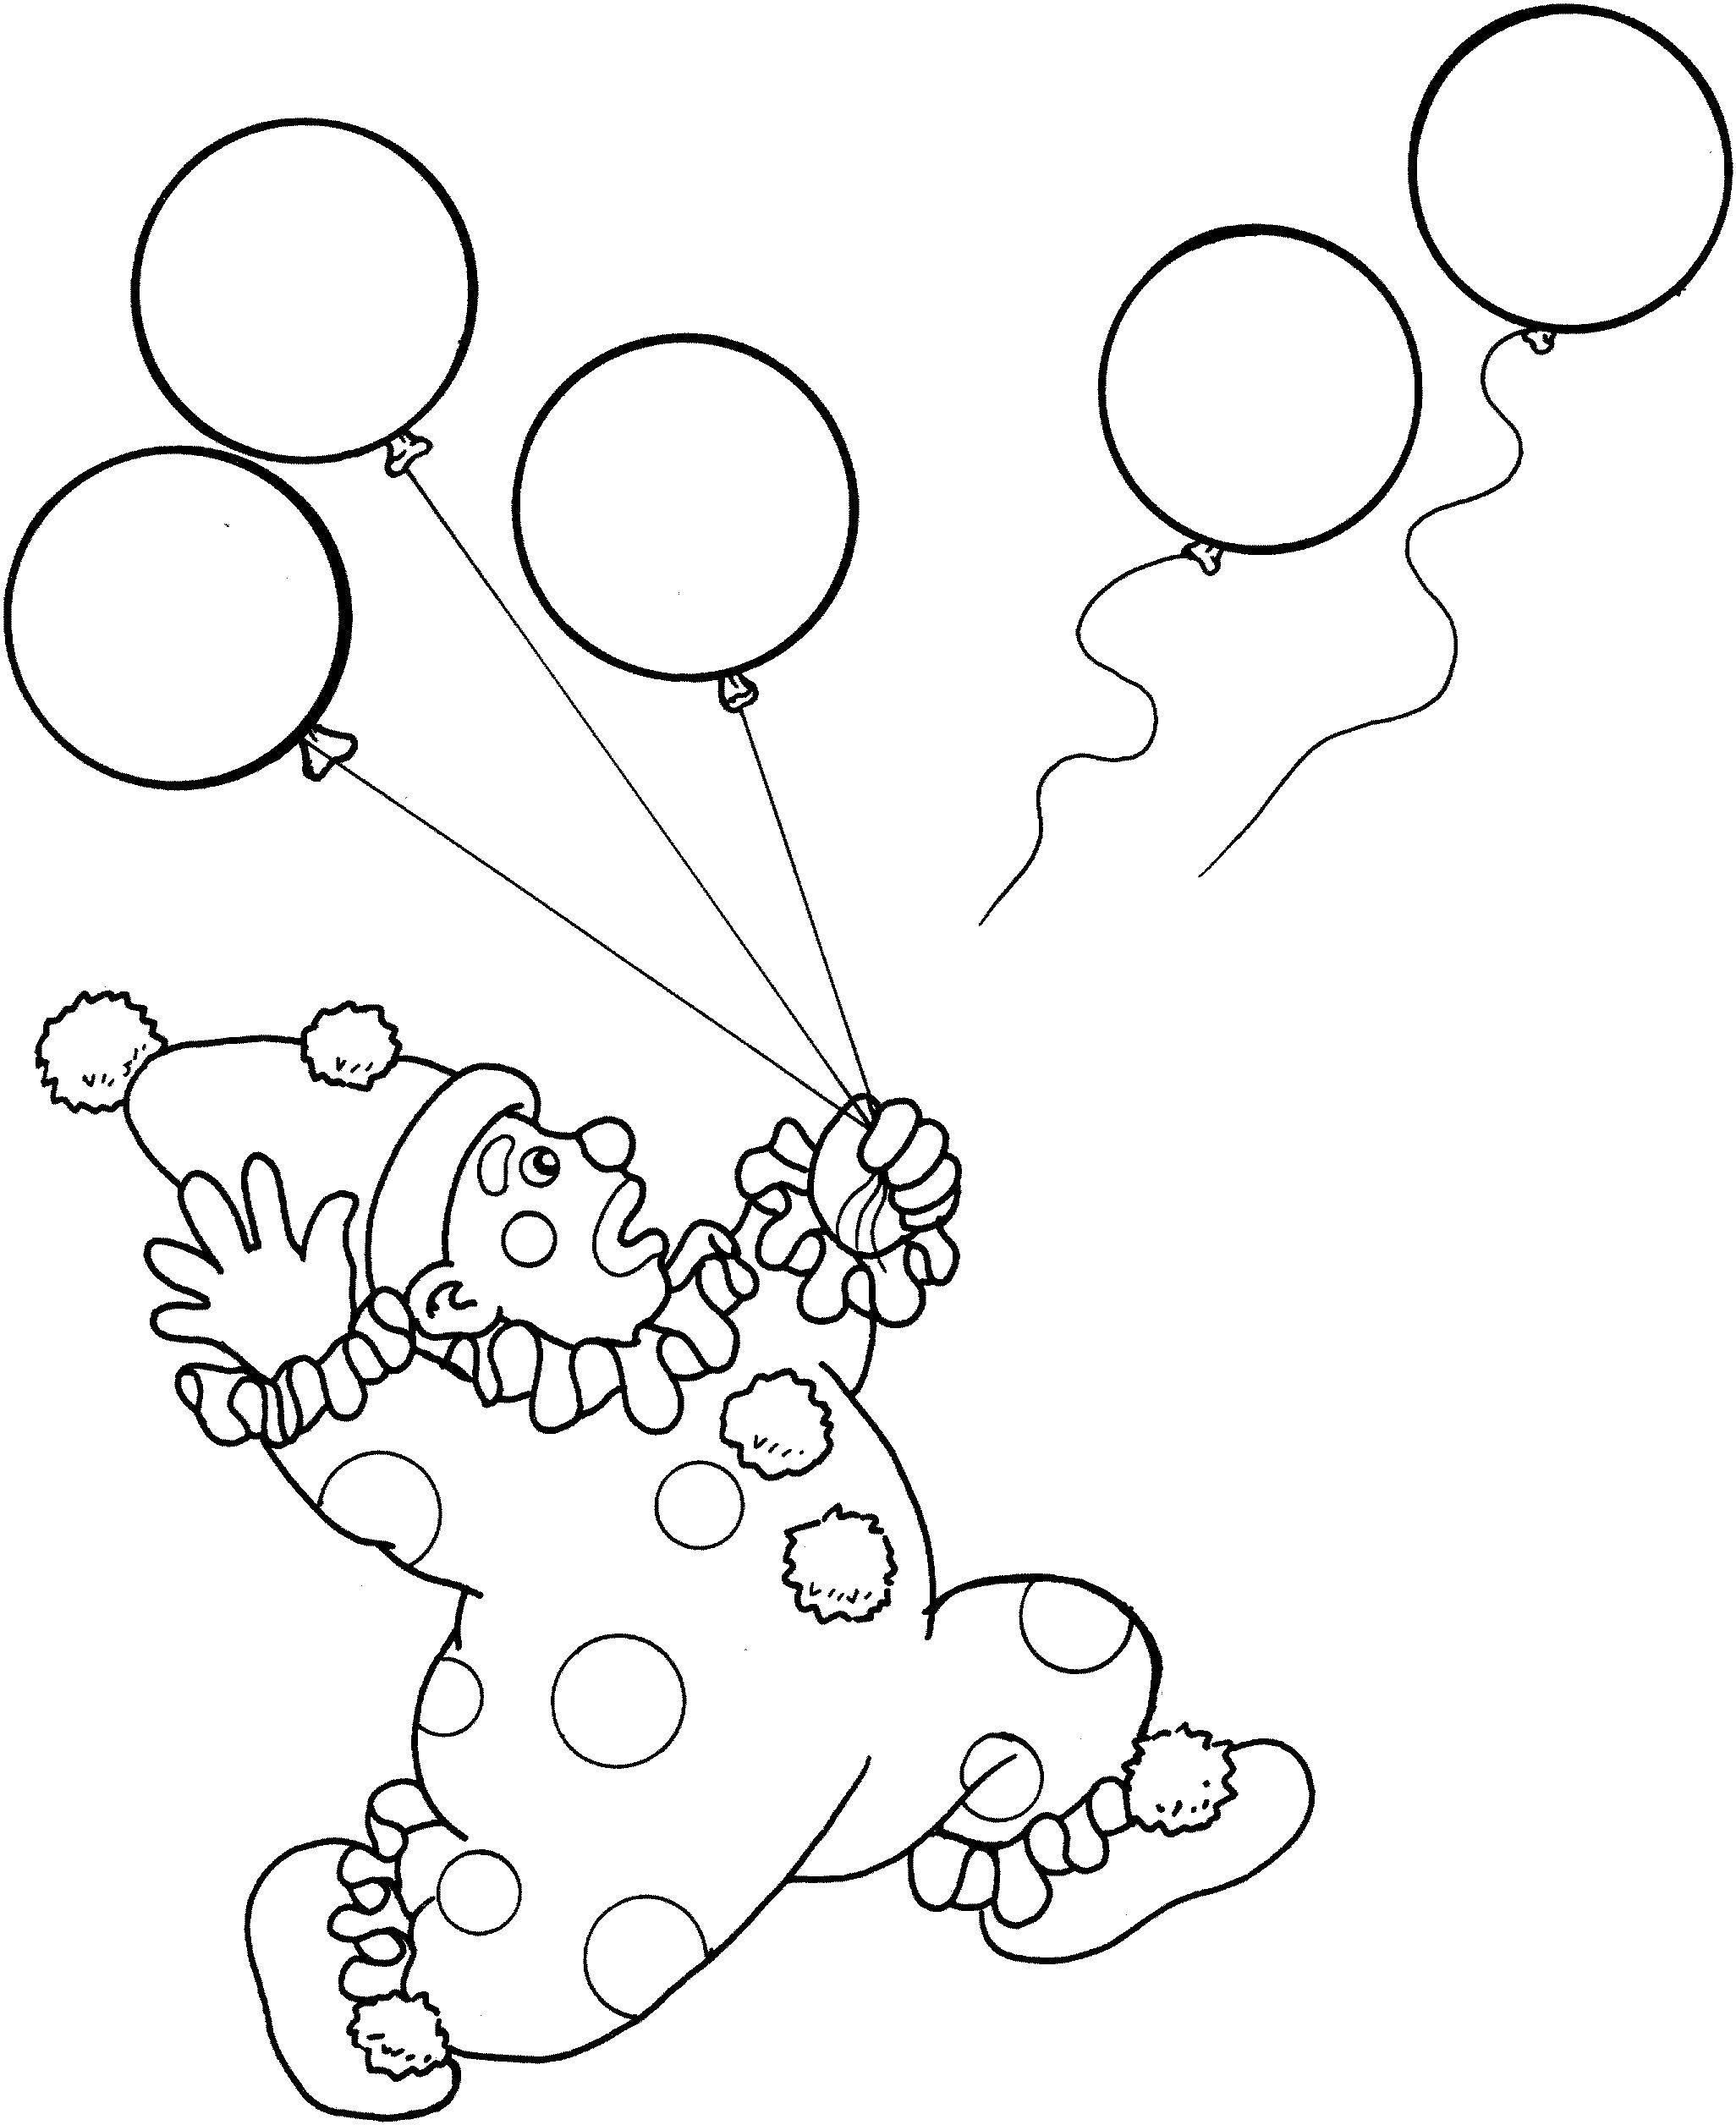 Раскраска Клоун и шарики Скачать клоуны, шарики.  Распечатать ,Клоуны,